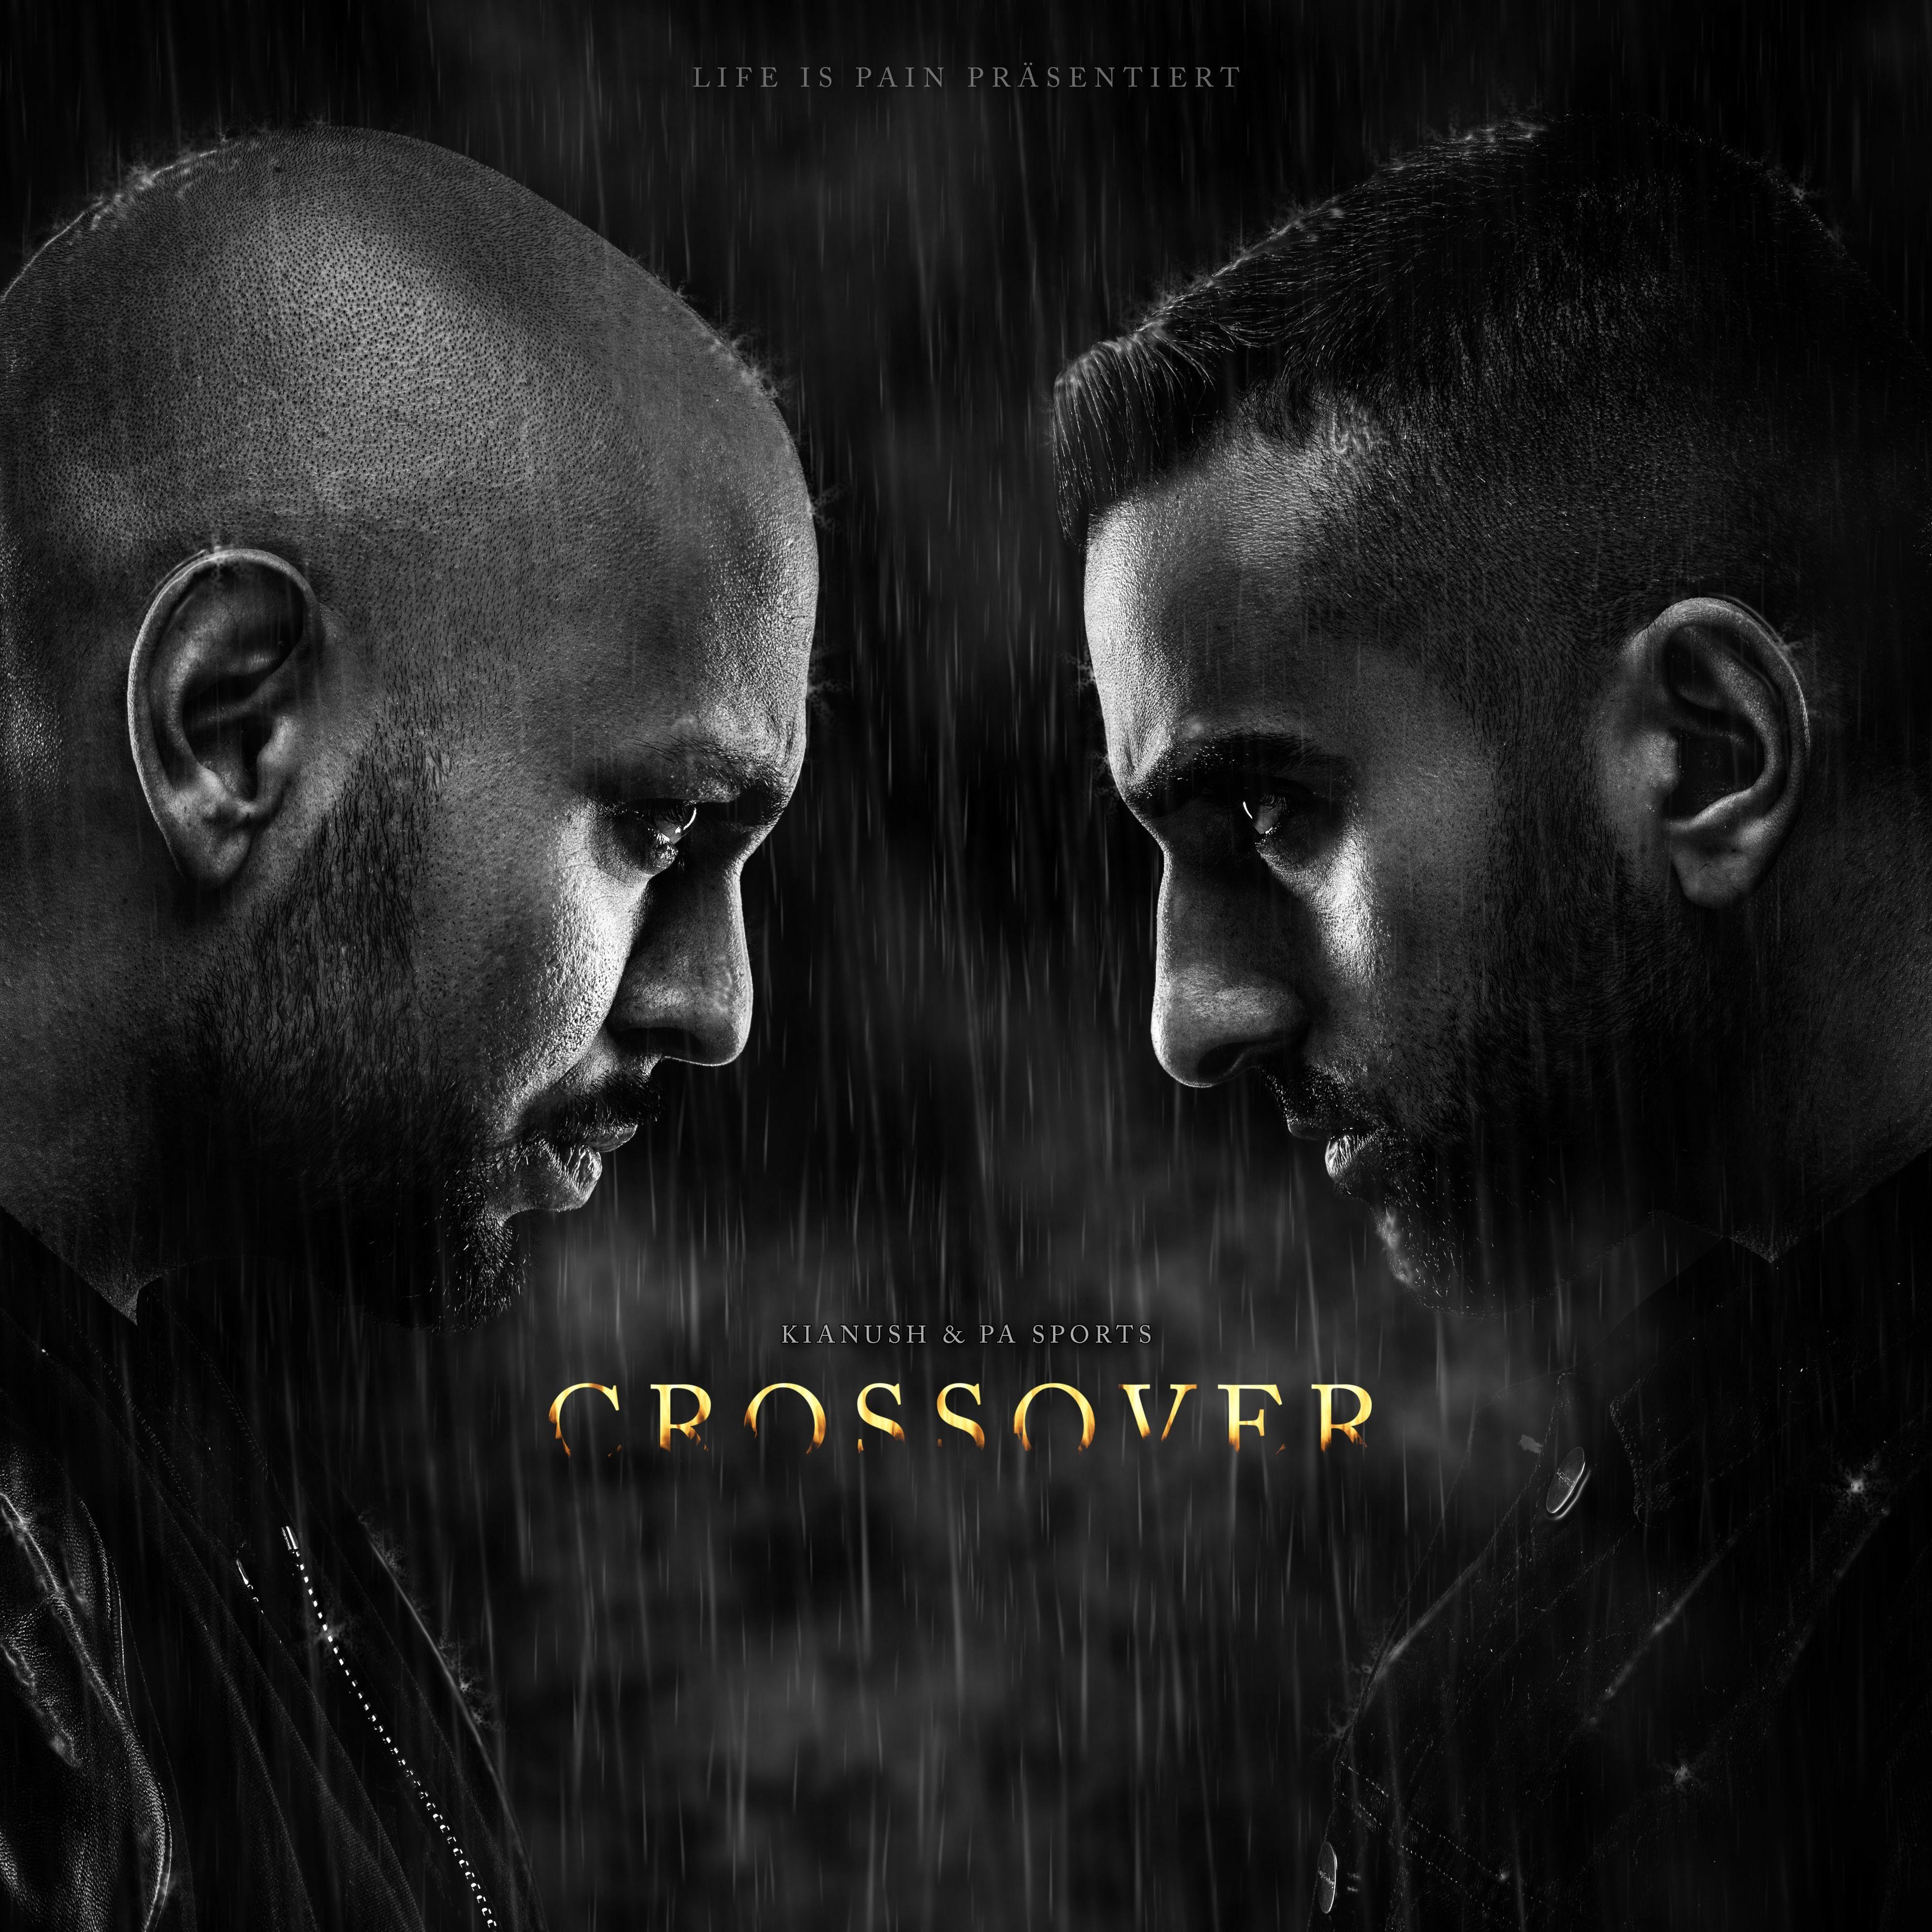 Kianush - Crossover album cover